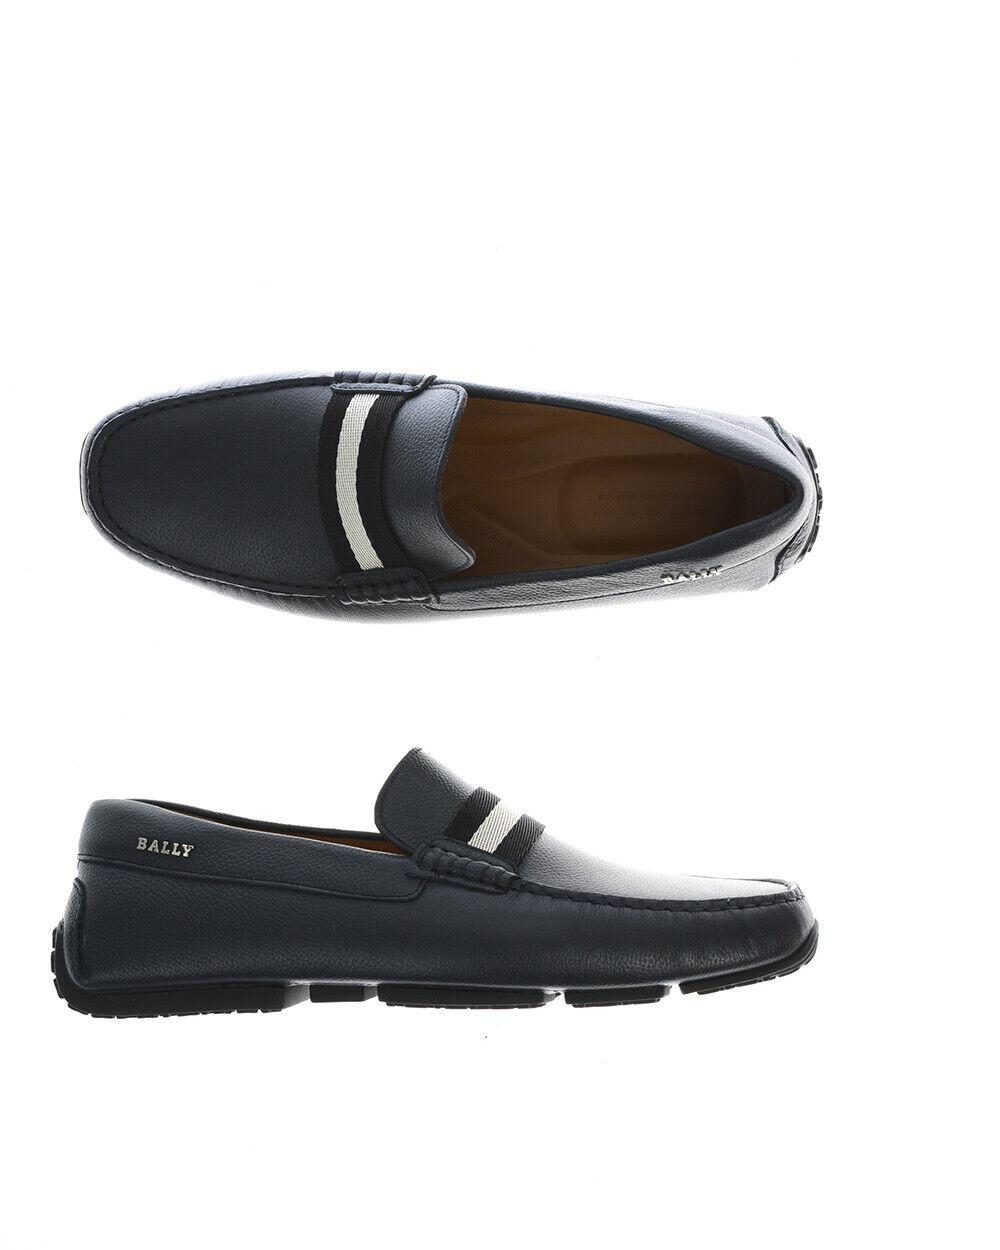 Bally Moccasin Chaussures Pearce en cuir Italie Homme Bleu 6206926 306 sz 40 FAIRE OFFRE